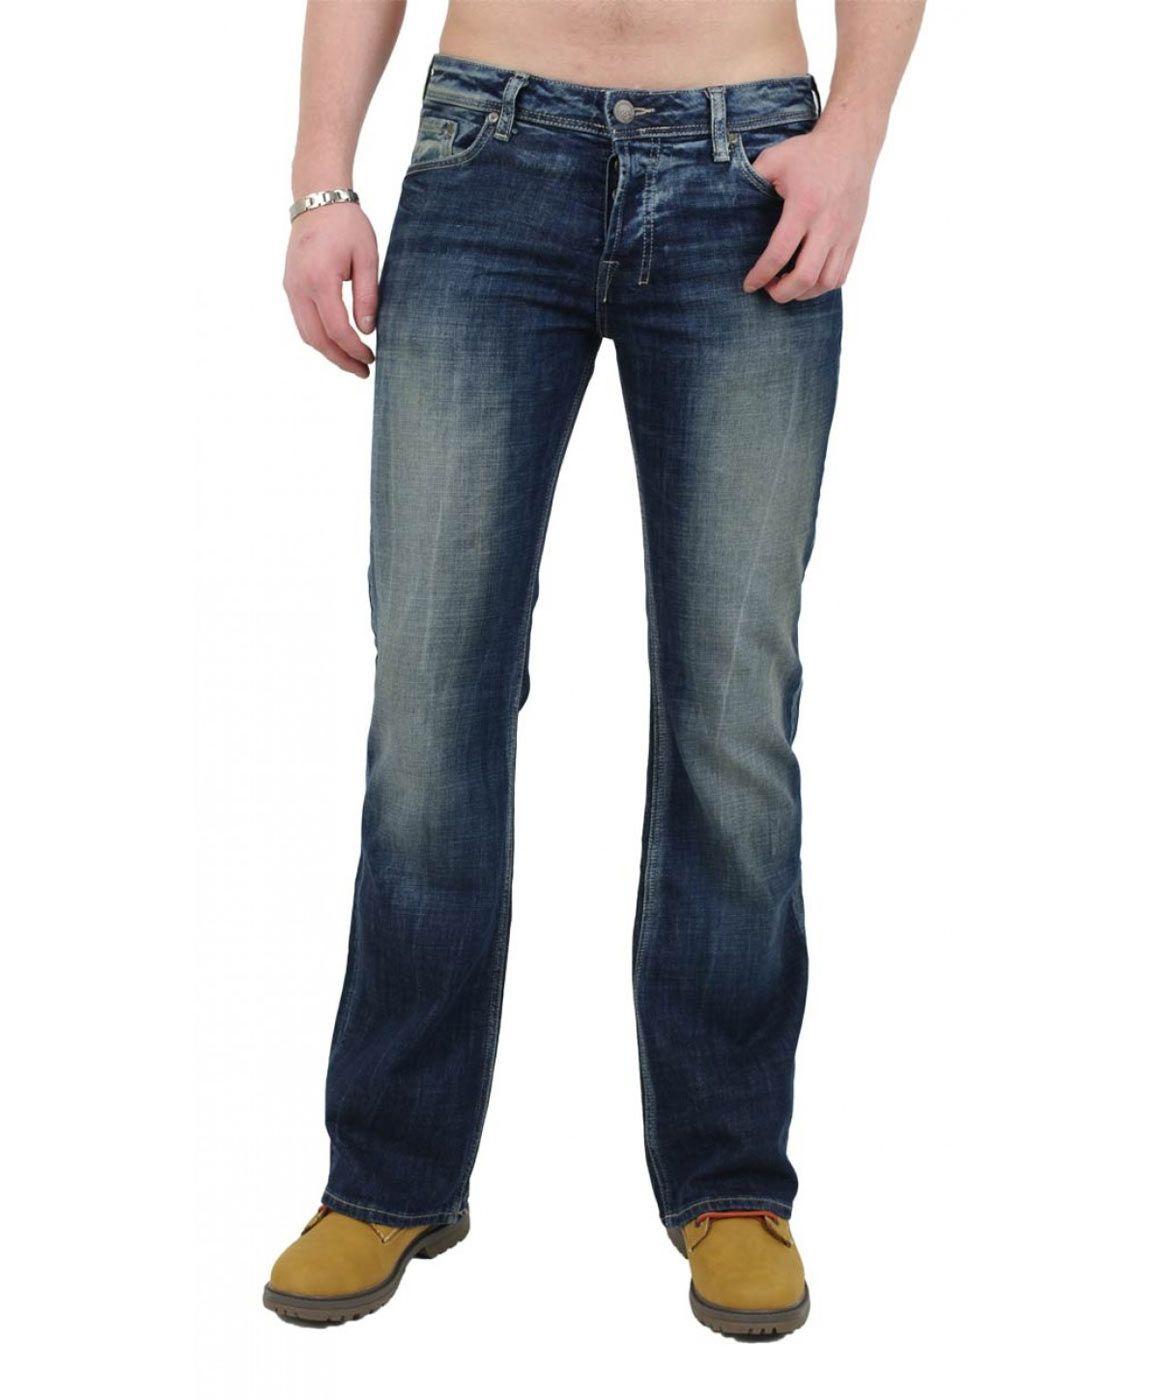 LTB Tinman Jeans Dark Blue Used